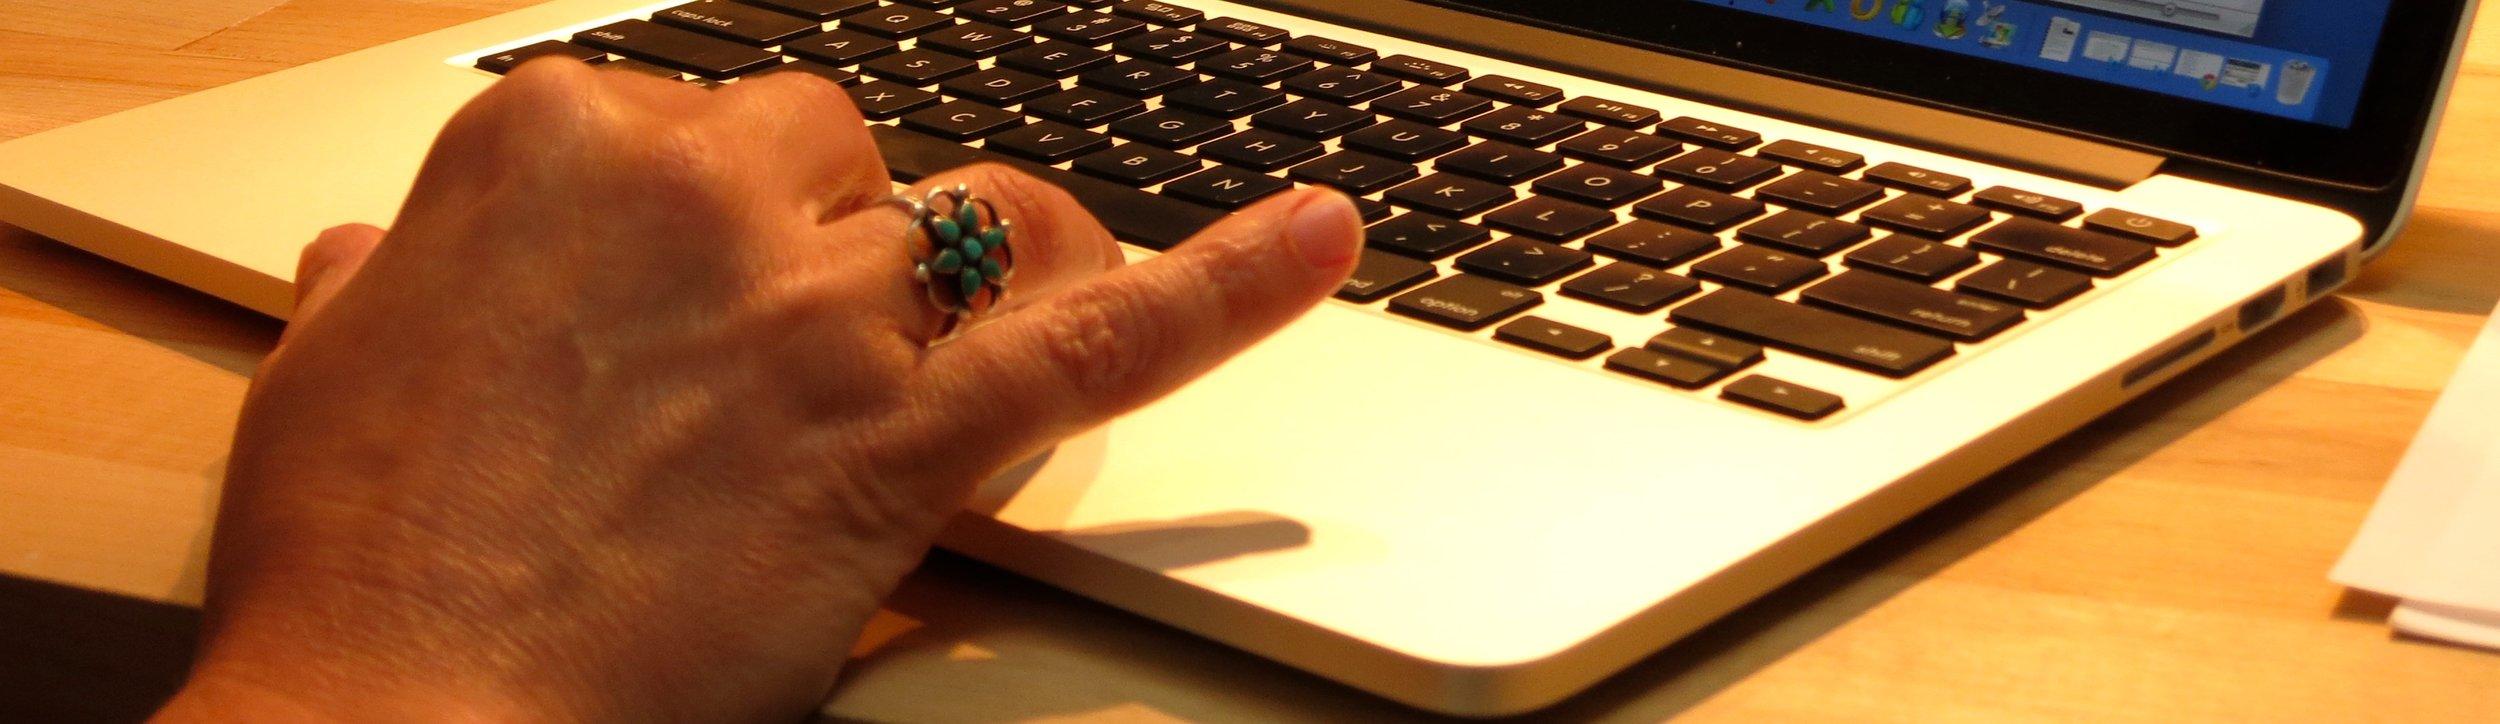 Final cropped keyboard photo.JPG